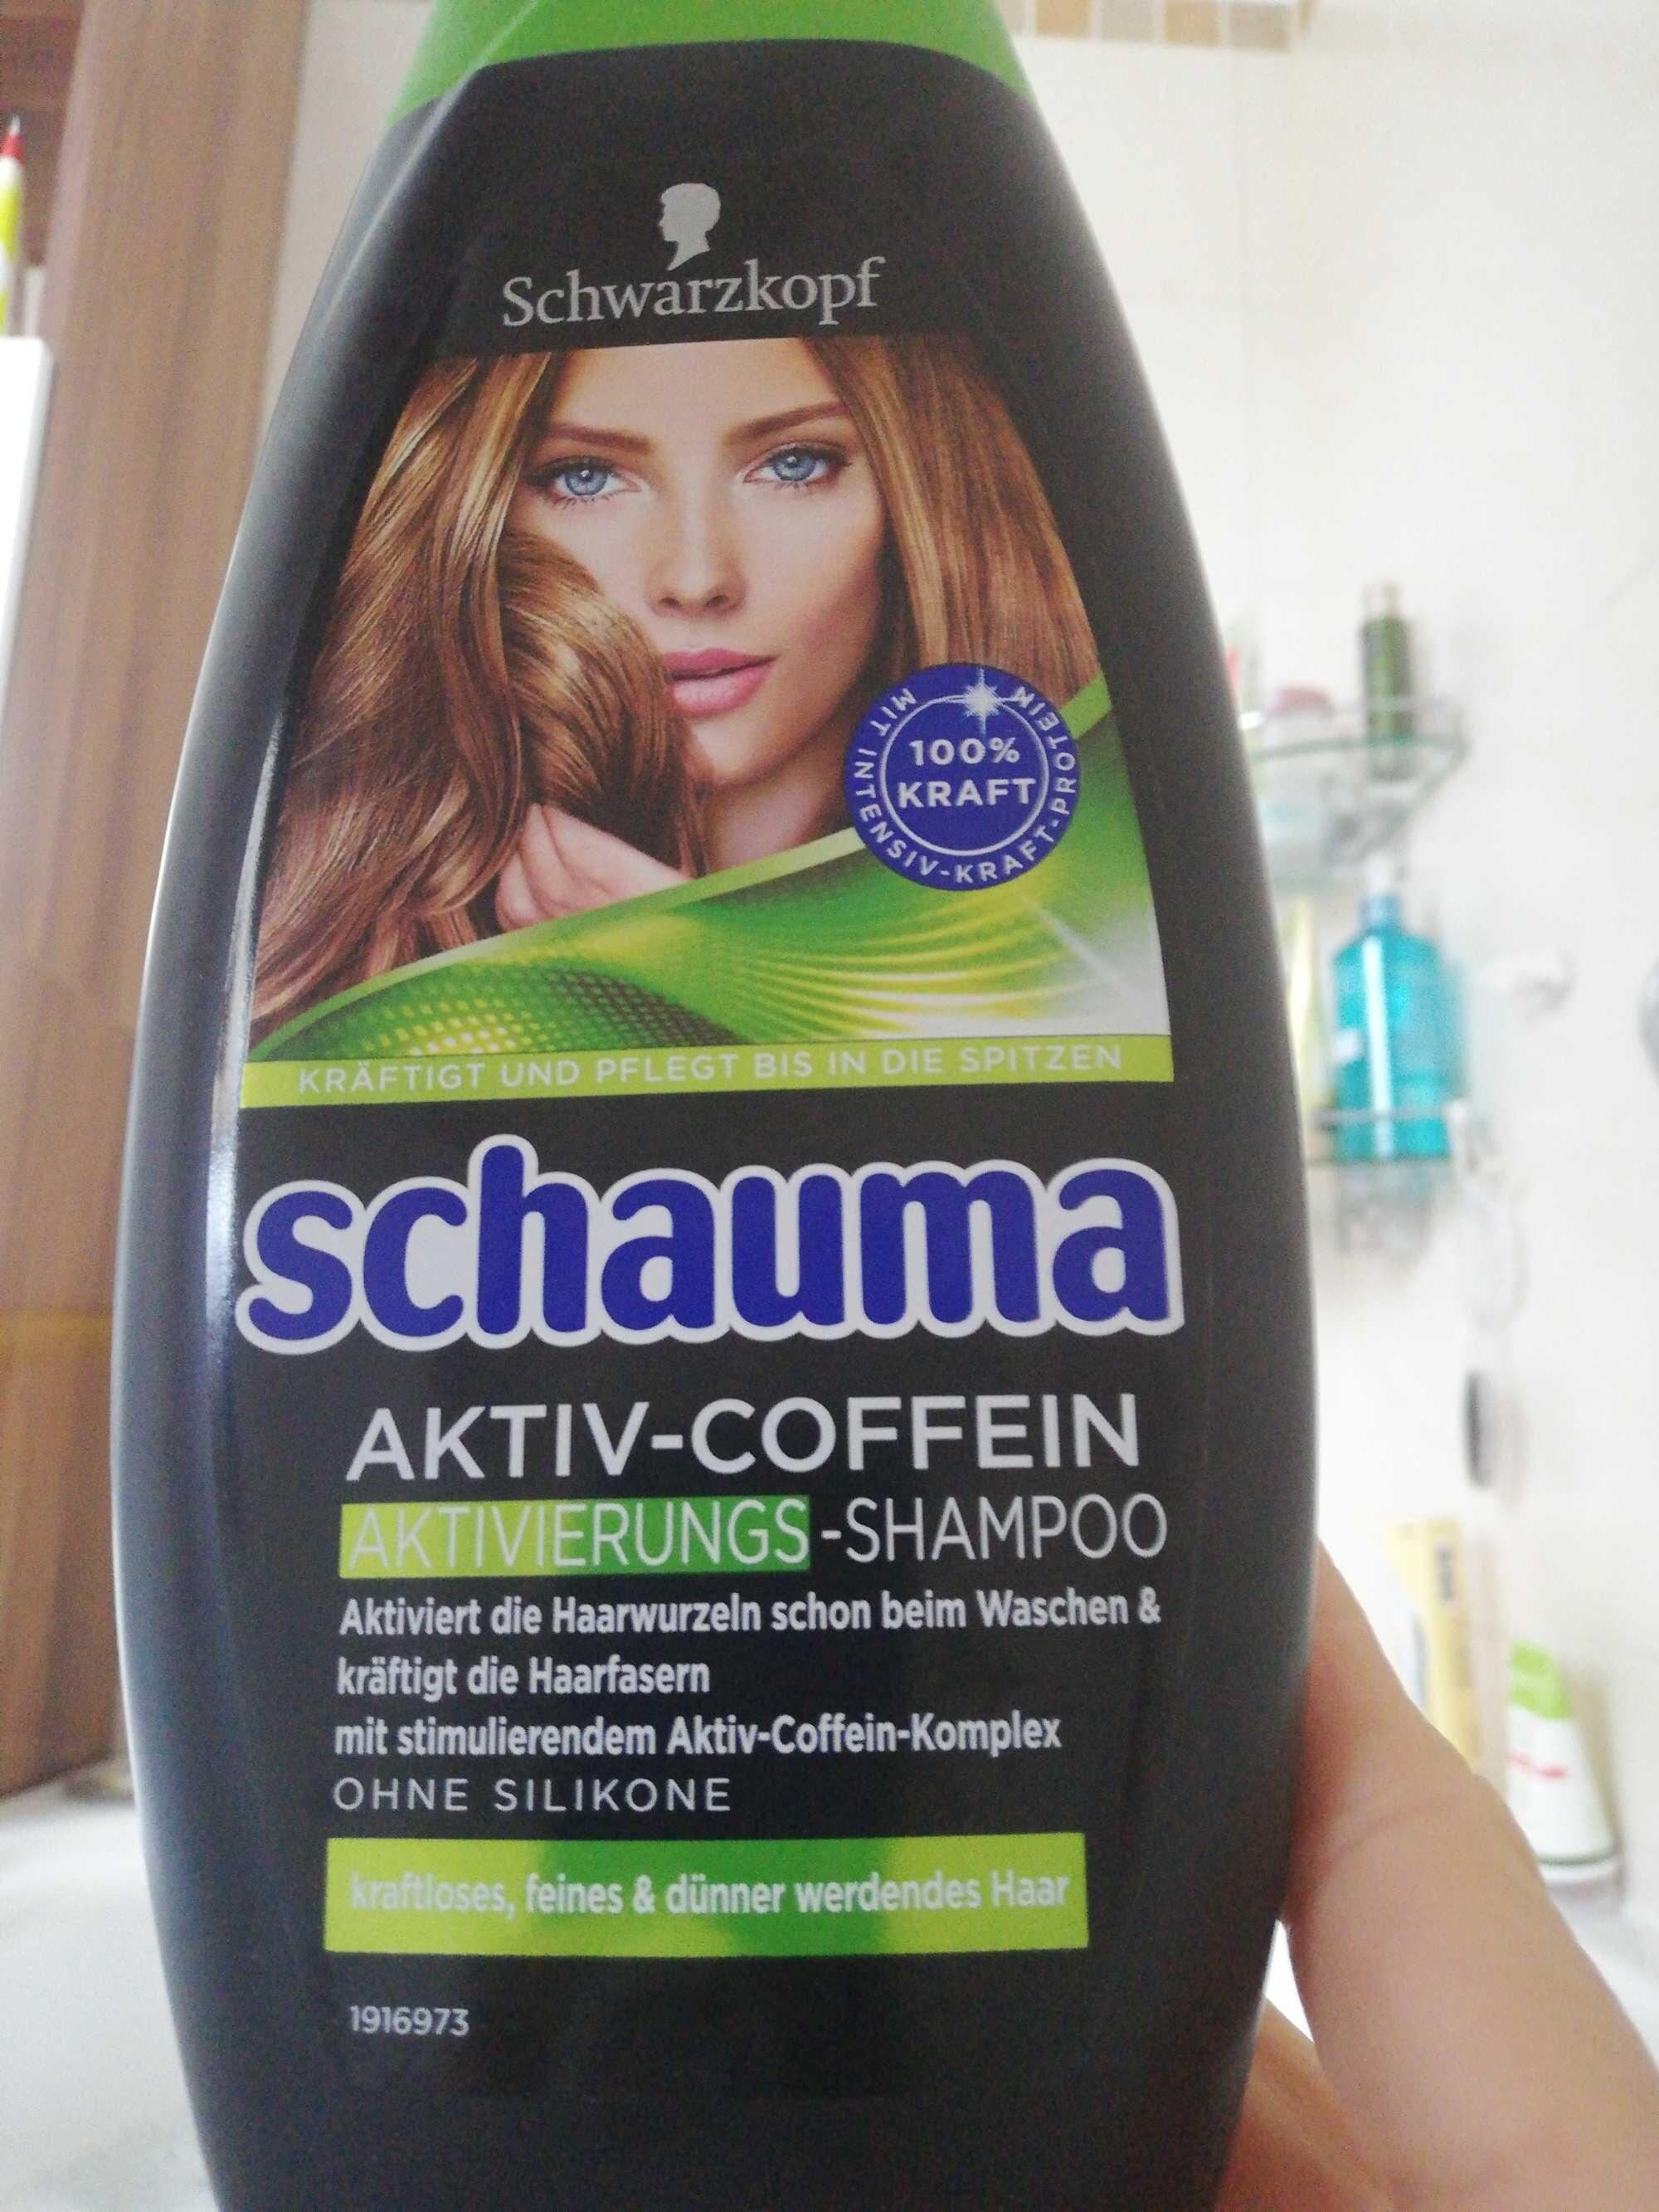 Aktiv-Coffein Aktivierungs-Shampoo - Product - de